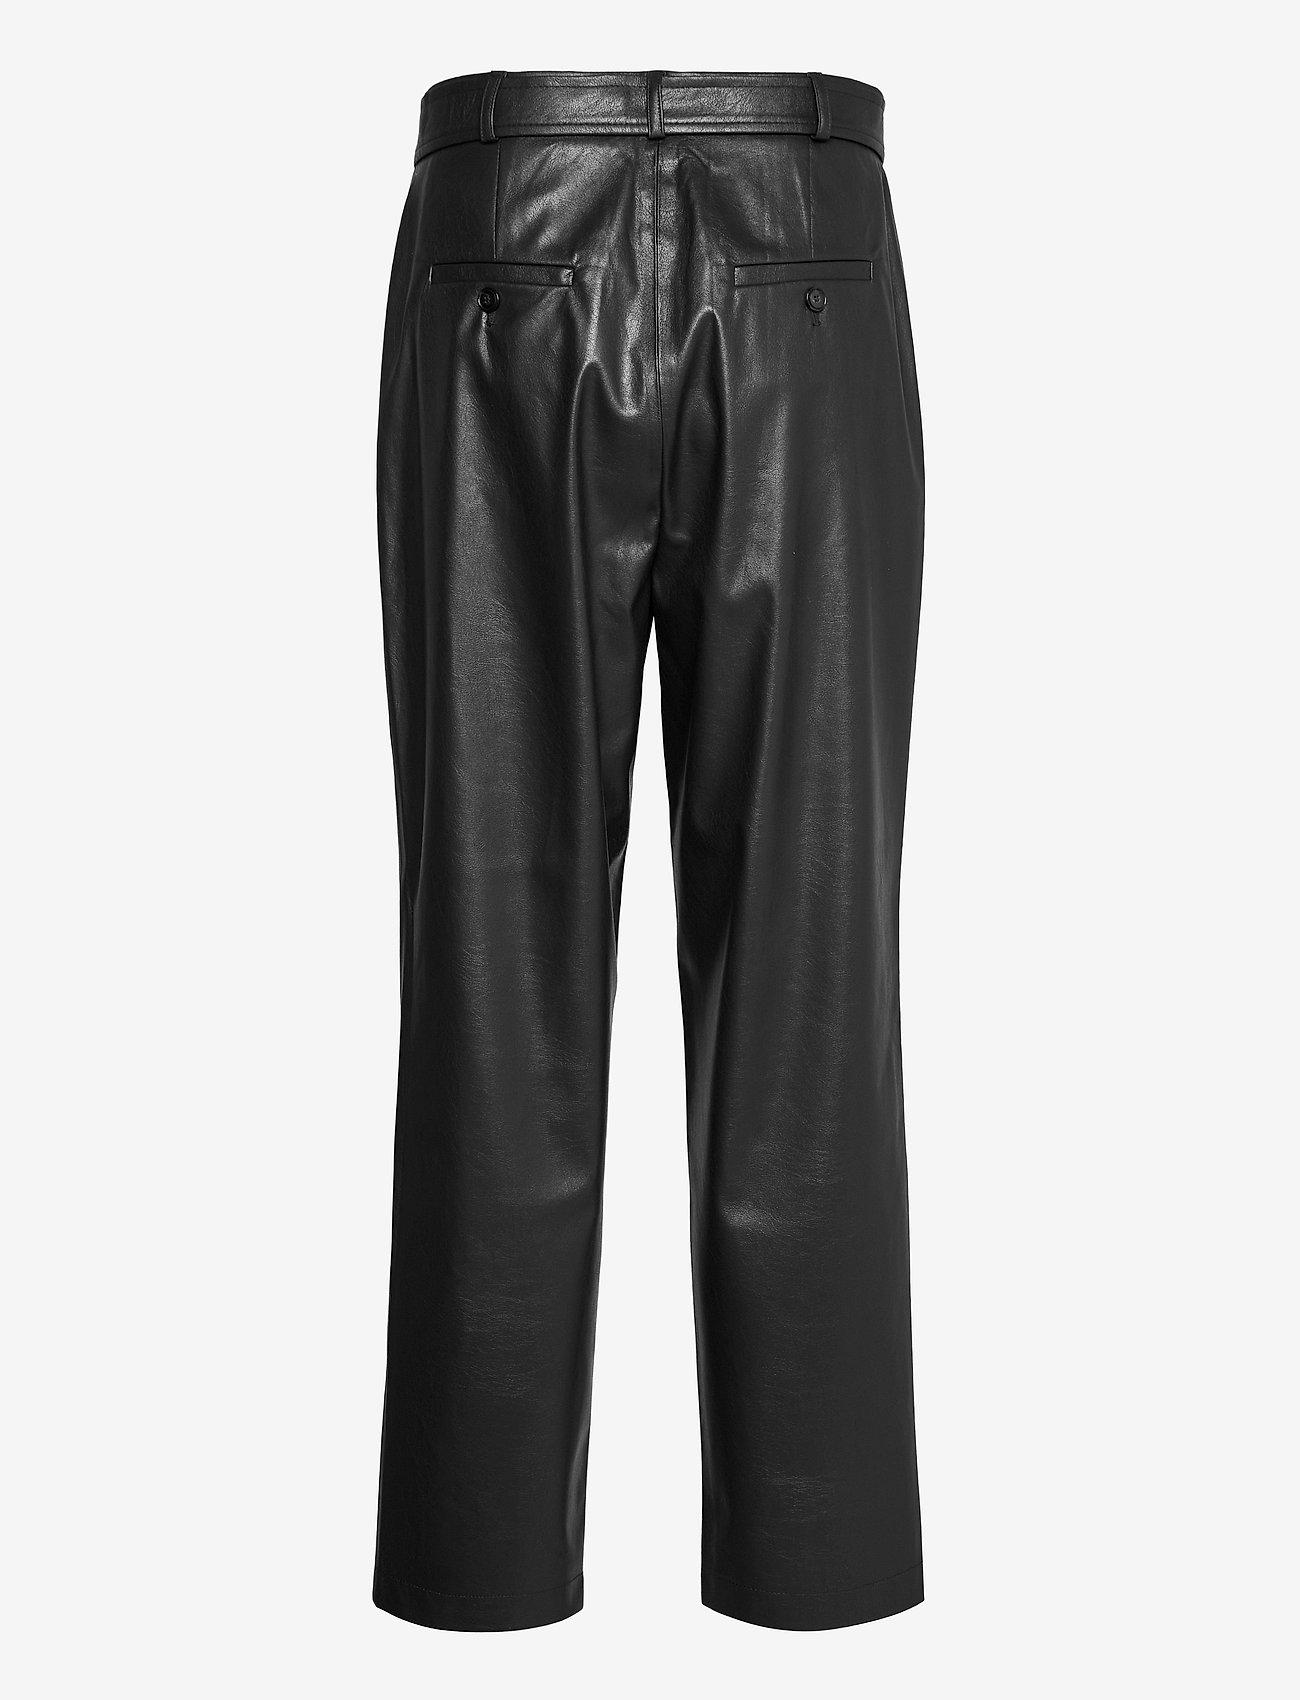 SAND - Vegan Leather - Haim - skinnbyxor - black - 1